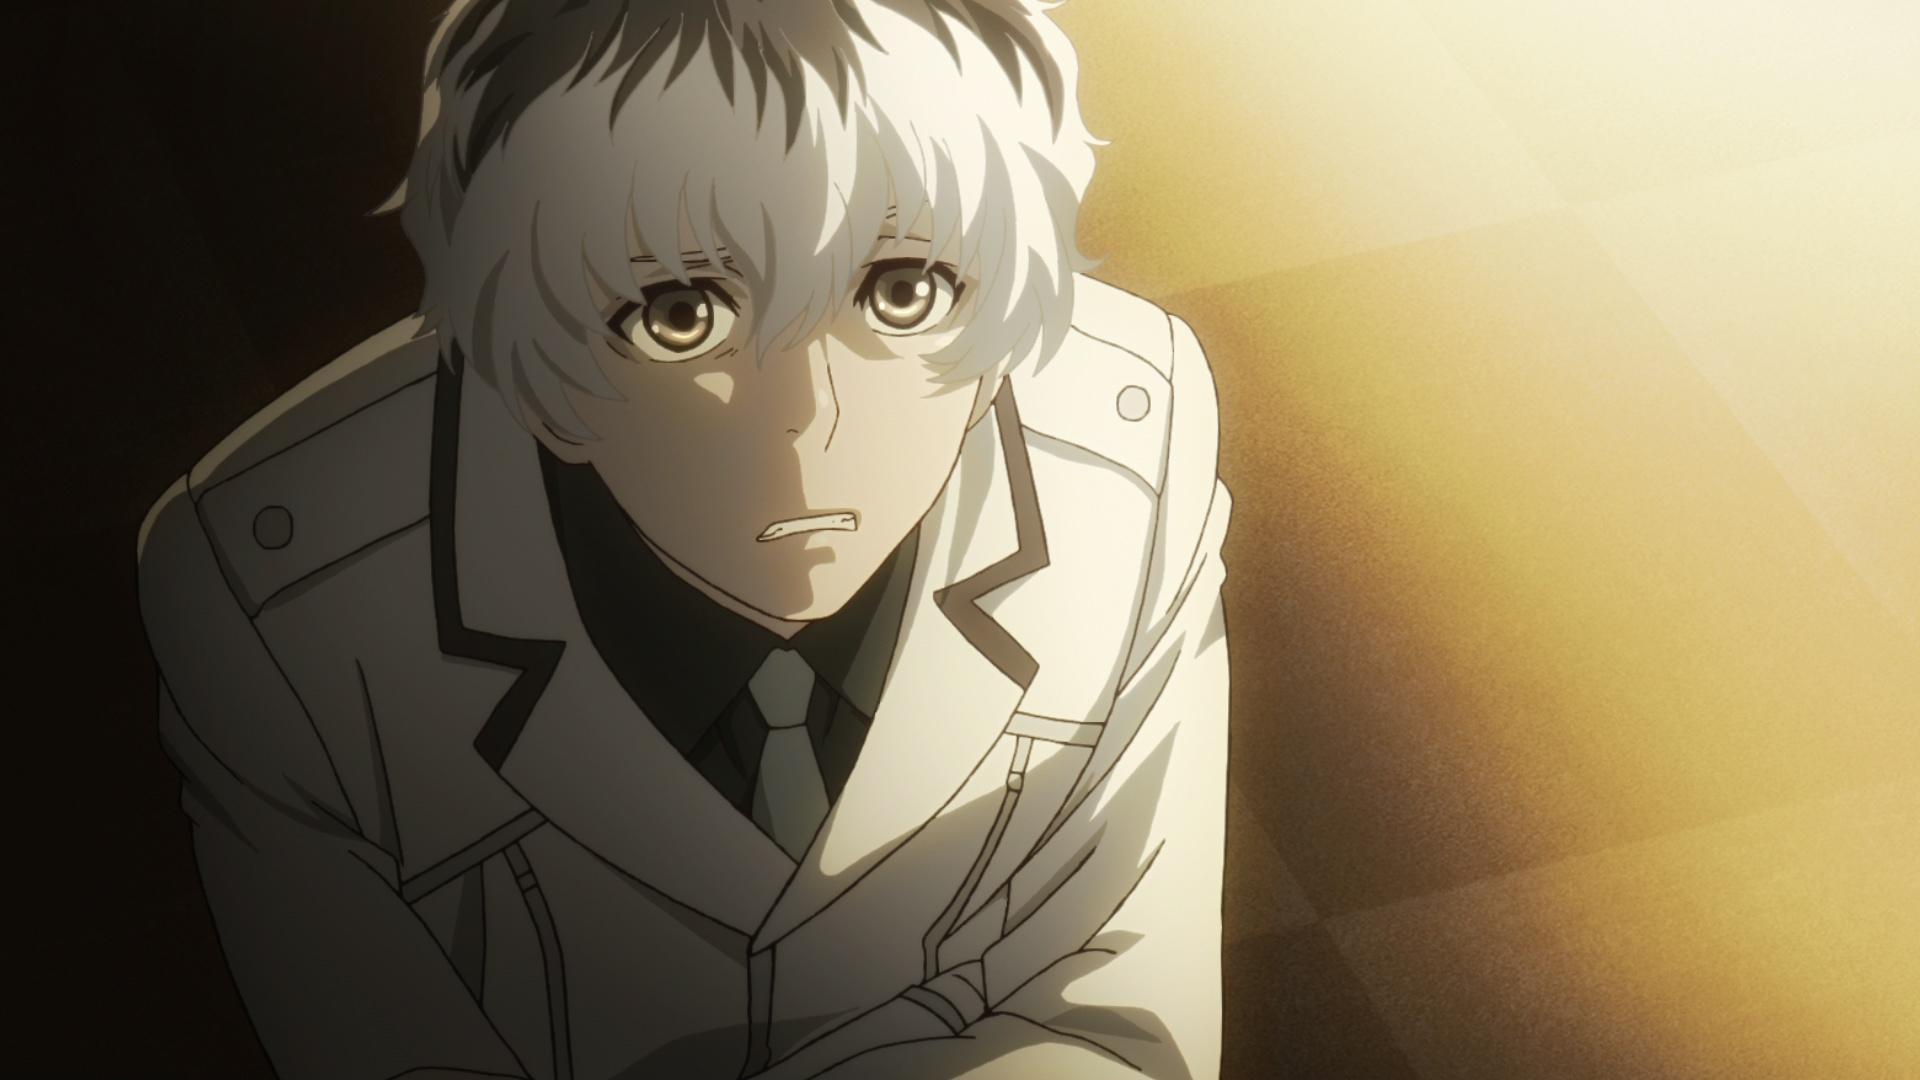 Watch Tokyo Ghoul Season 3 Episode 1 Sub & Dub | Anime Uncut